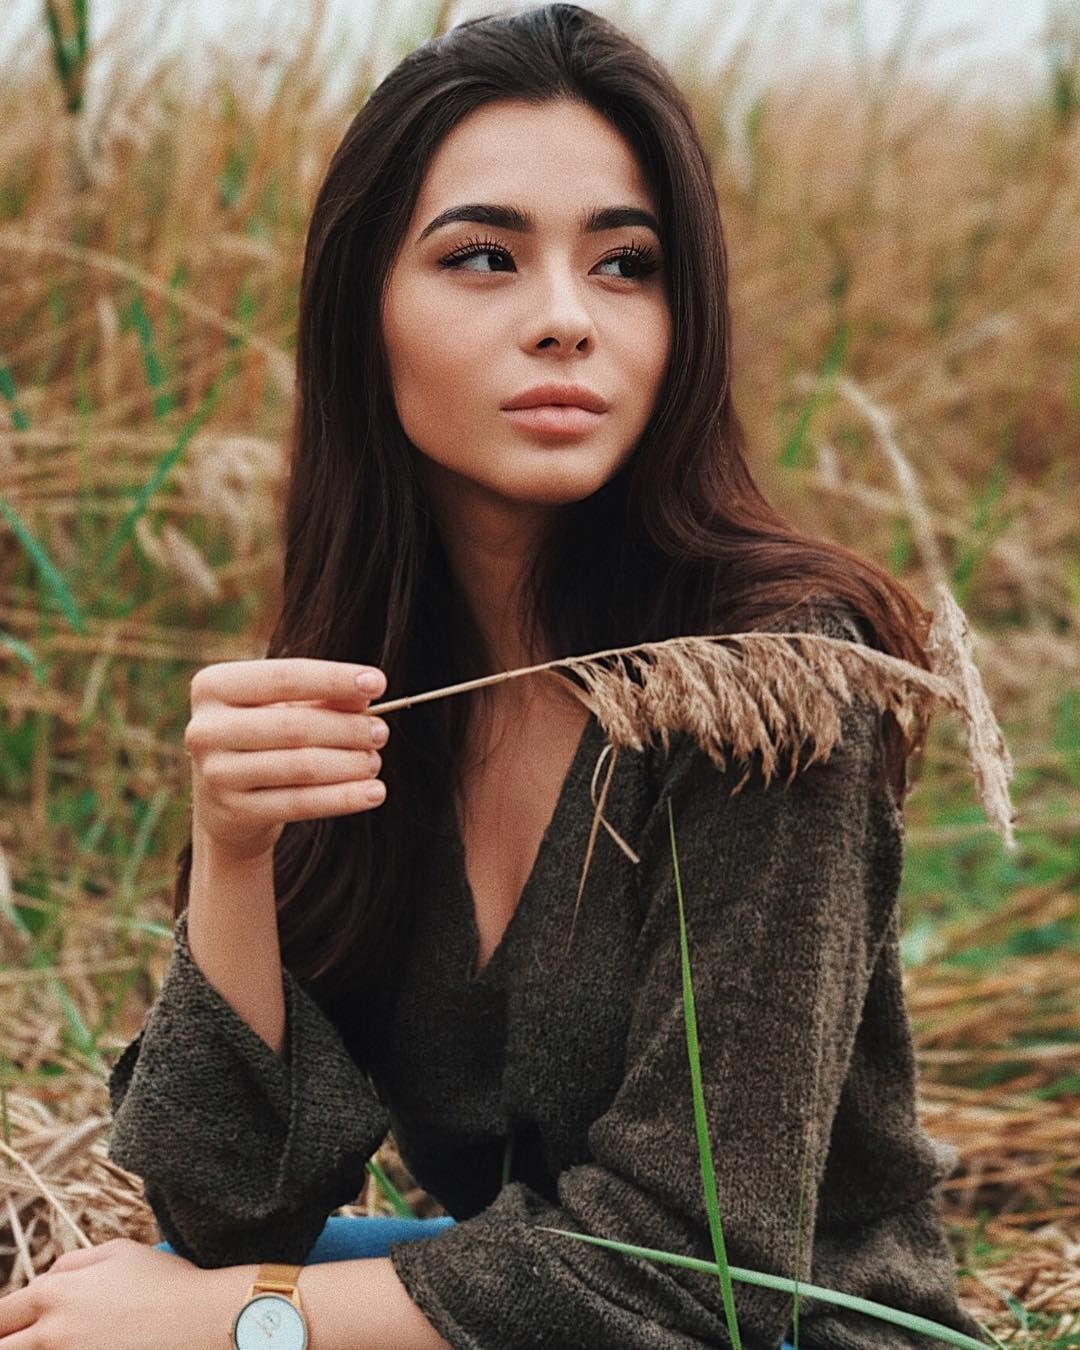 Имя актрисы этого видео sweet little latin girl